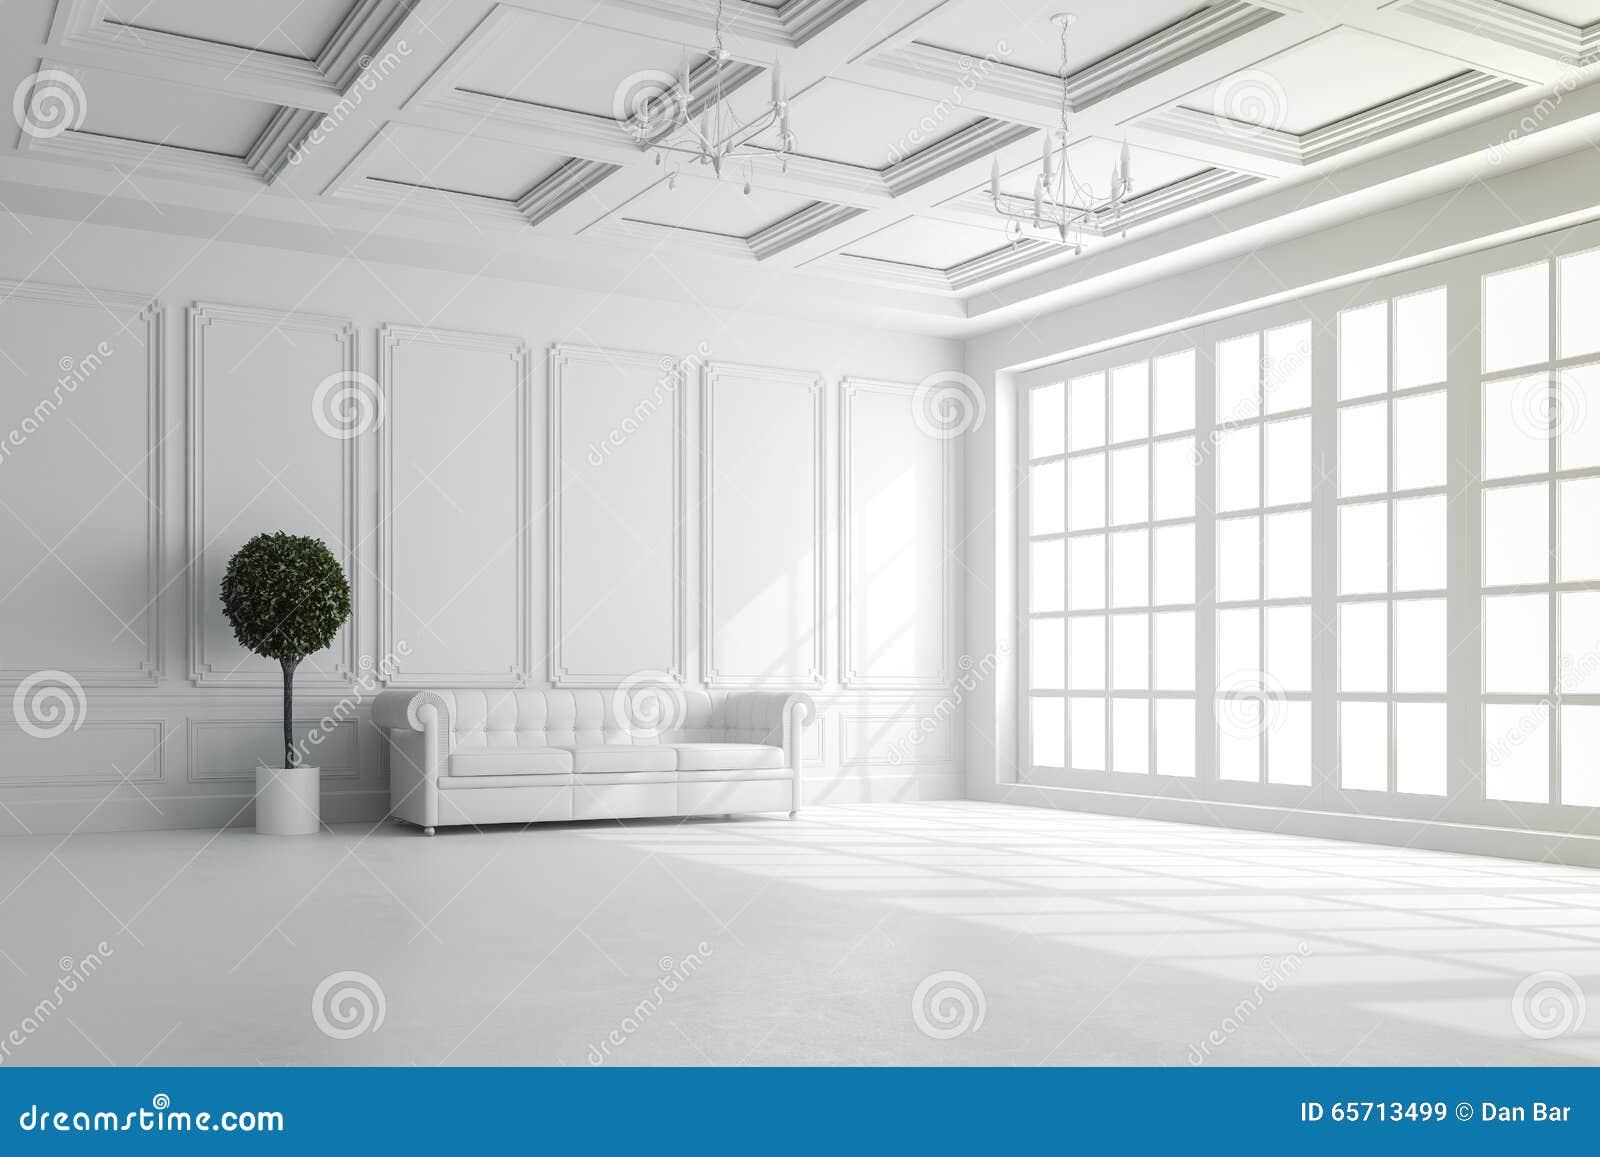 3d geef van mooi binnenland met witte muren en plafondopstelling terug